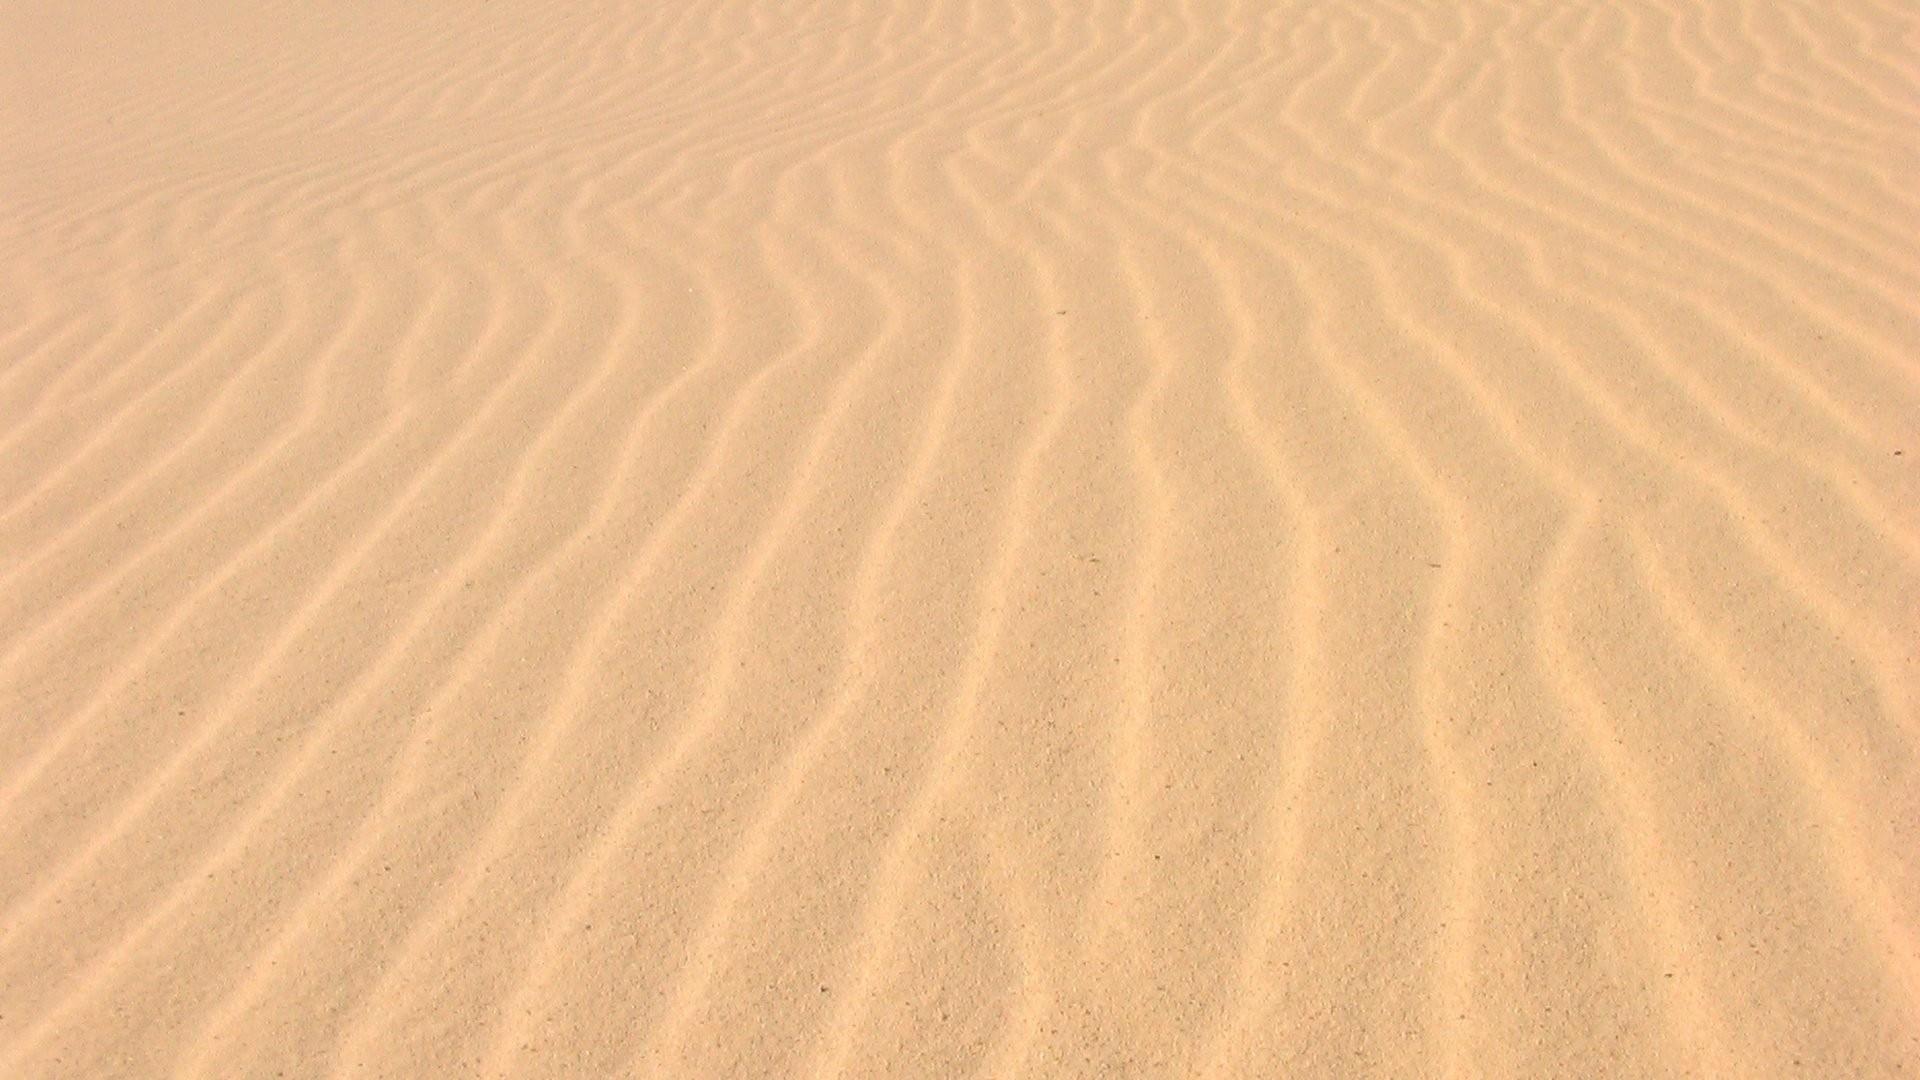 Texture Sand wallpaper for desktop